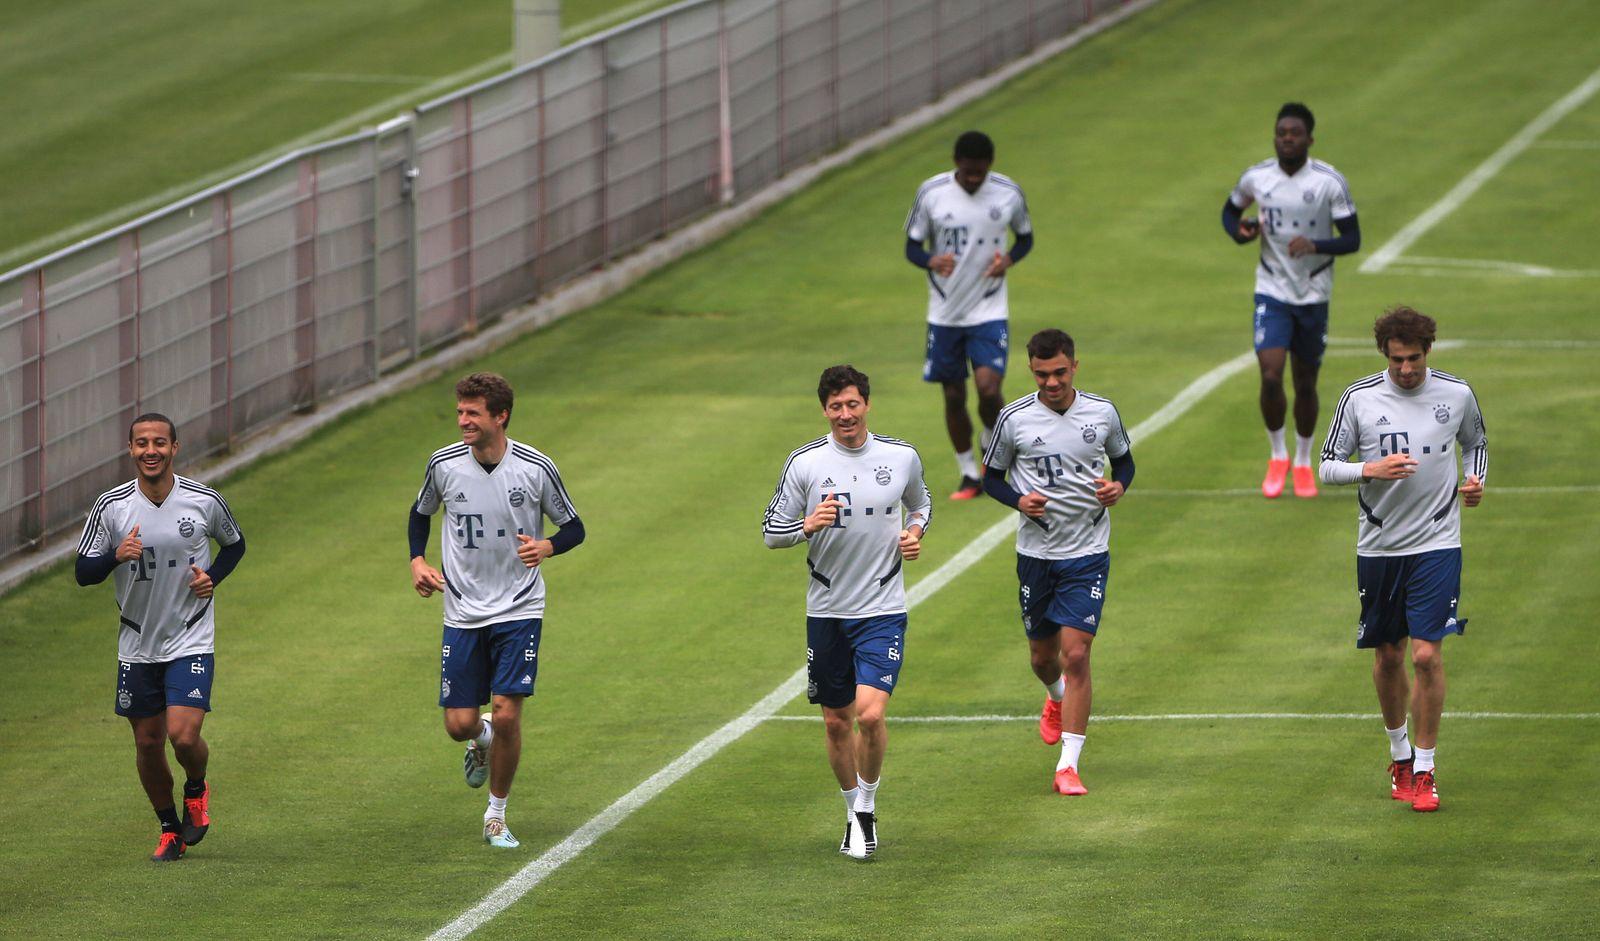 01.05.2020, FCB Training, Saebenerstrasse Muenchen, Fussball, im Bild: Thiago (FCB), Thomas Mueller (FCB), Robert Lewan